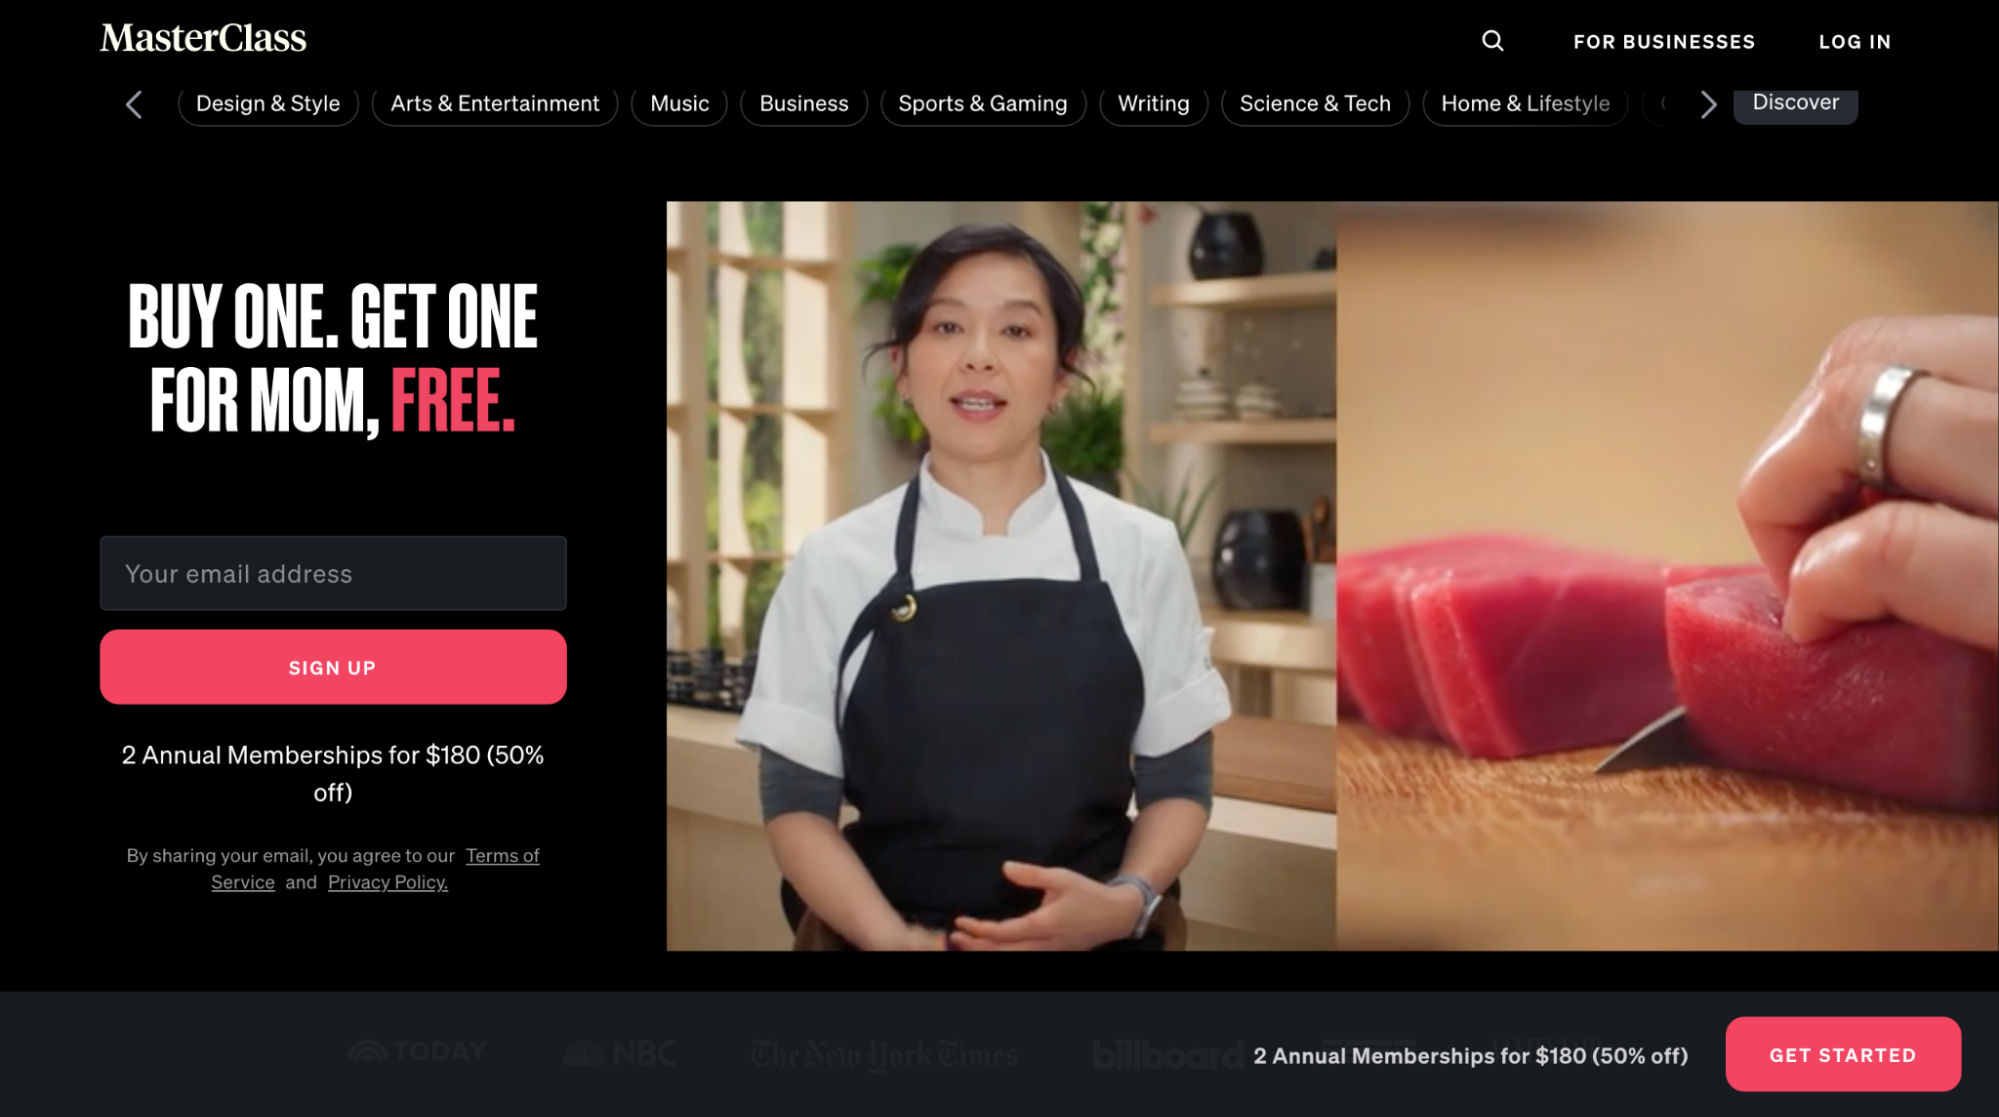 MasterClass's website